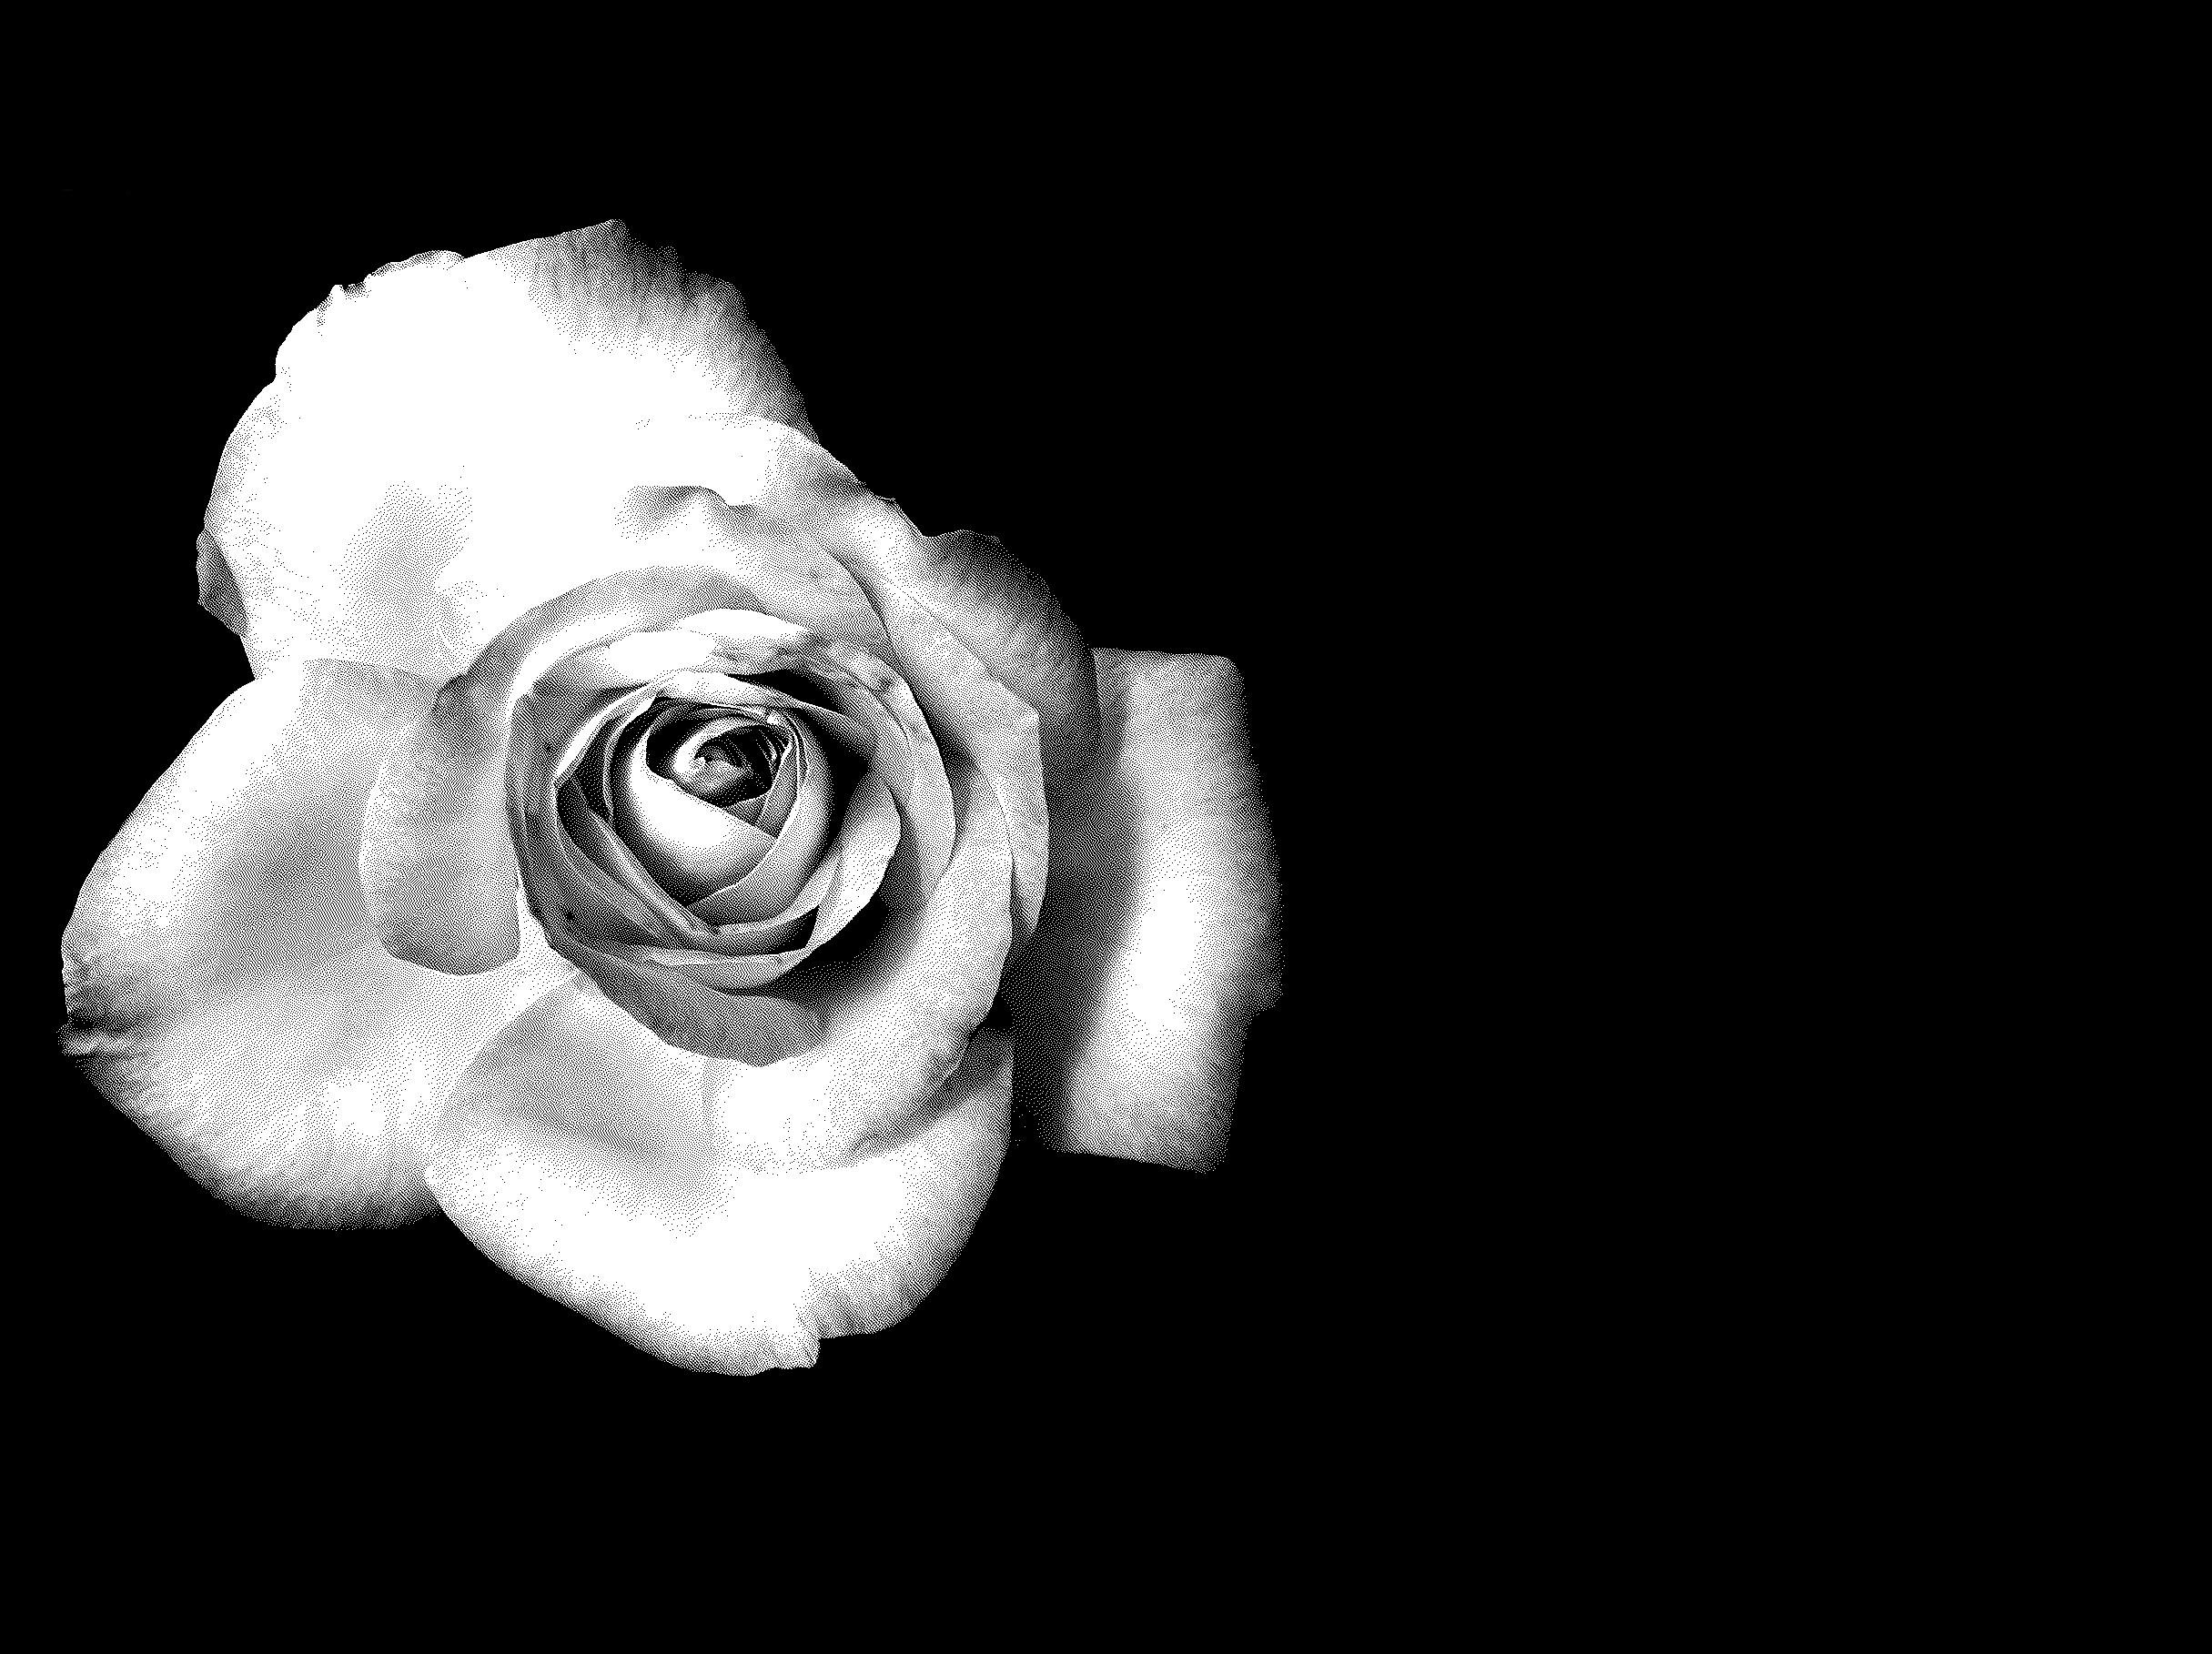 black and white rose Desktop wallpapers